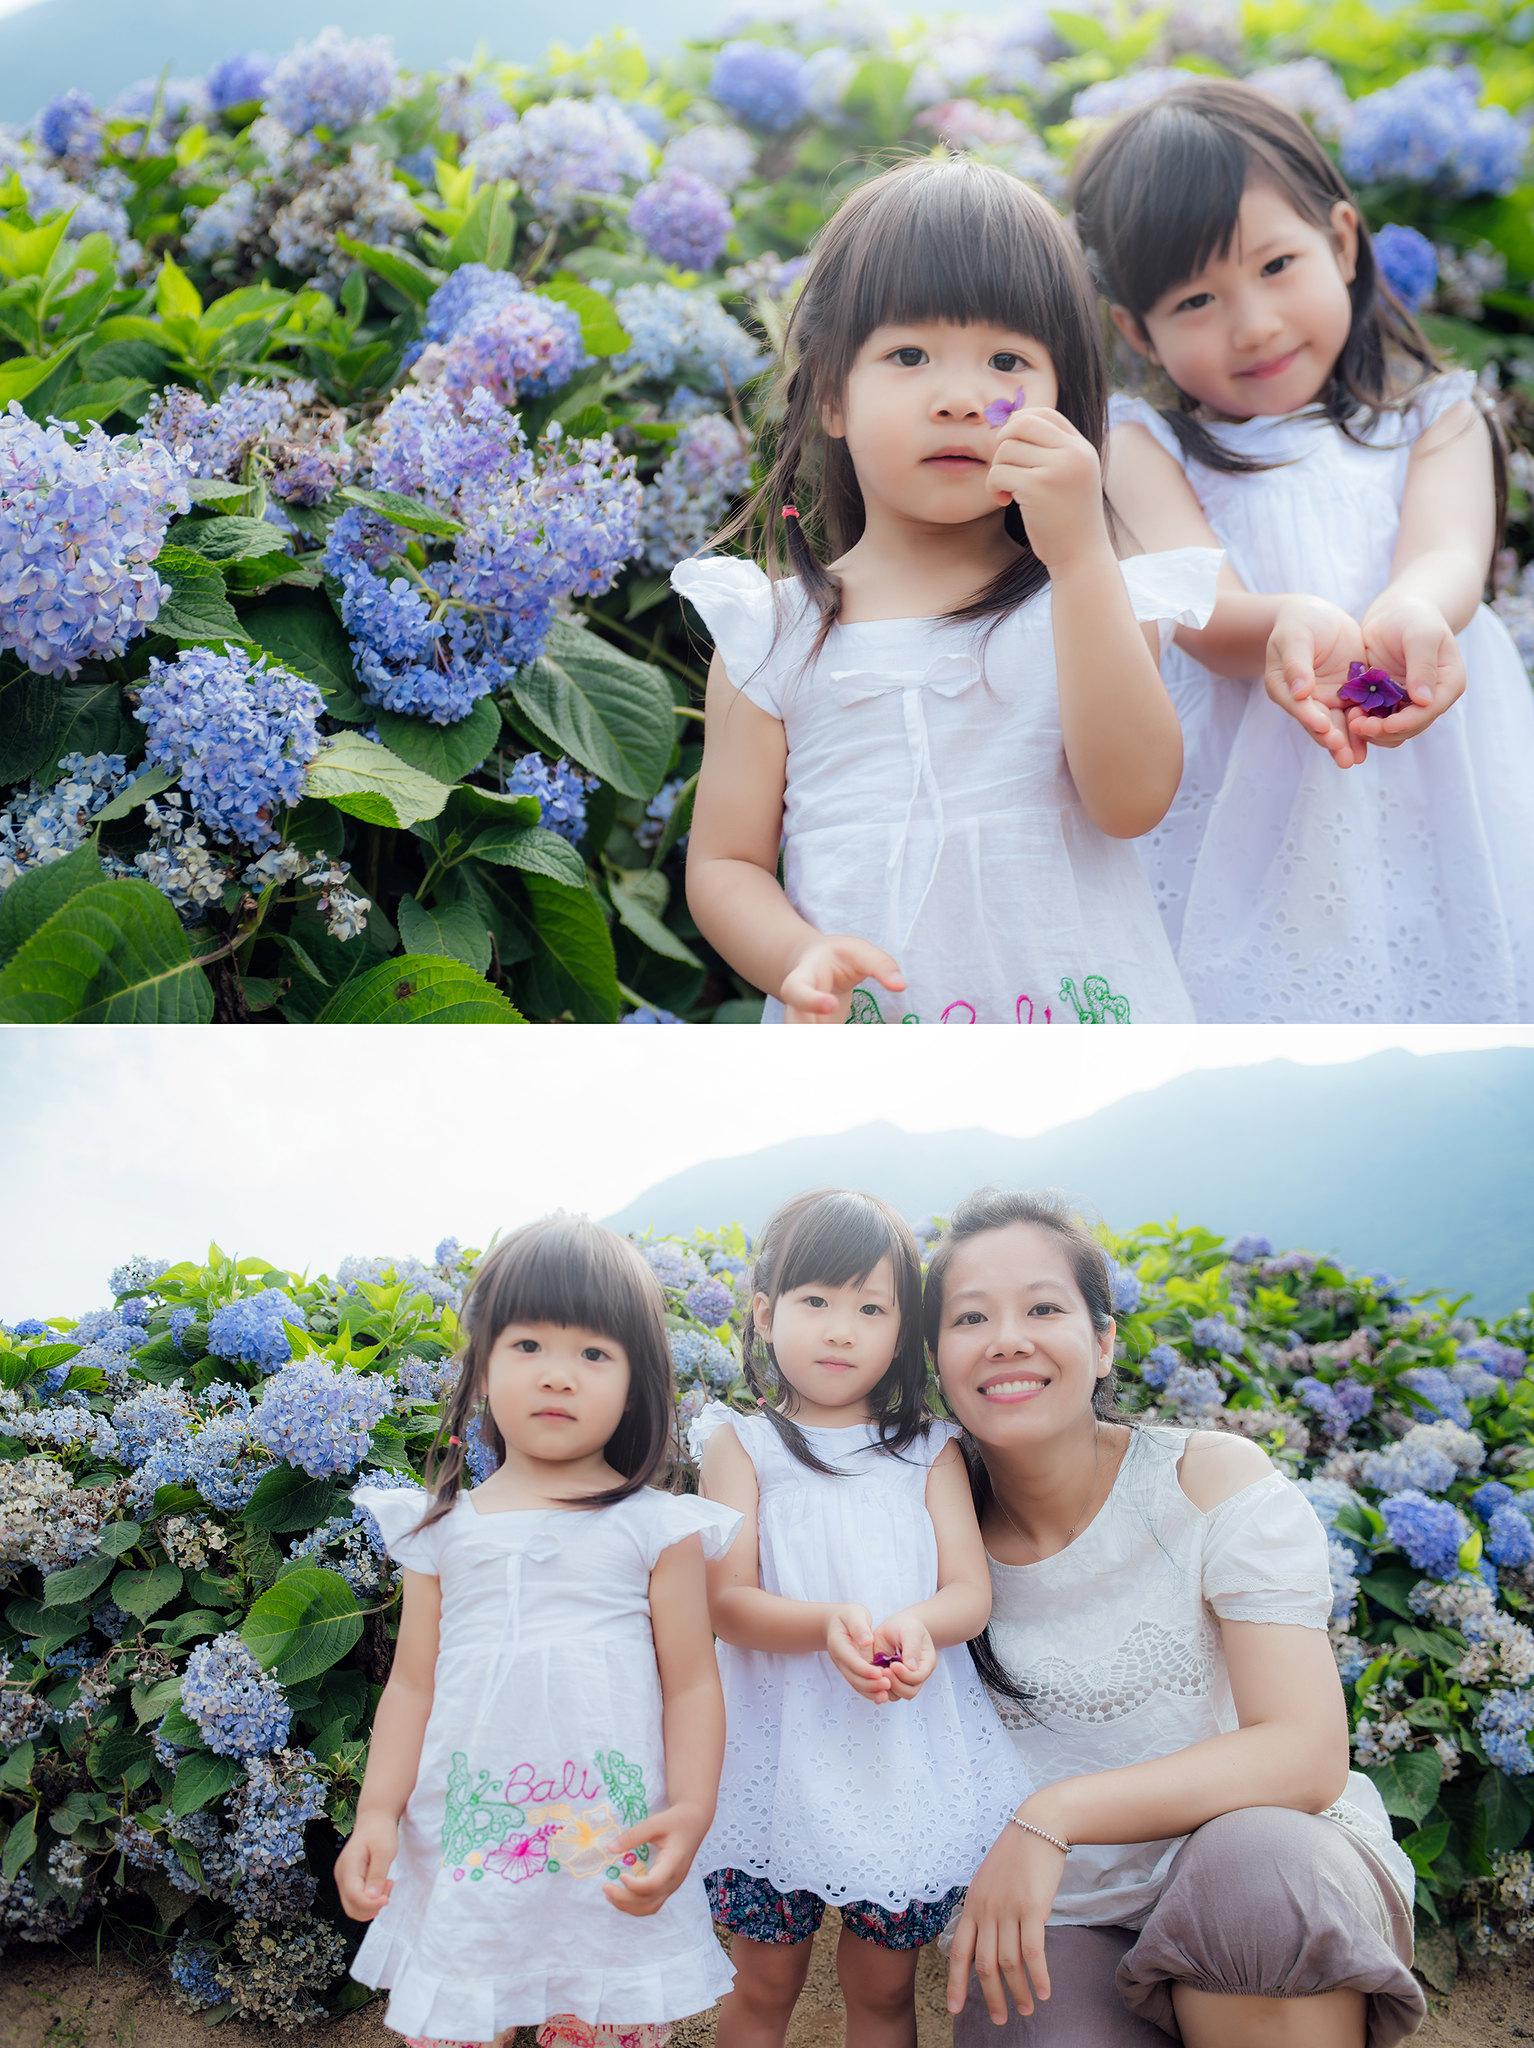 45051353681 06783b869b k - 【親子寫真】+Cathy family+